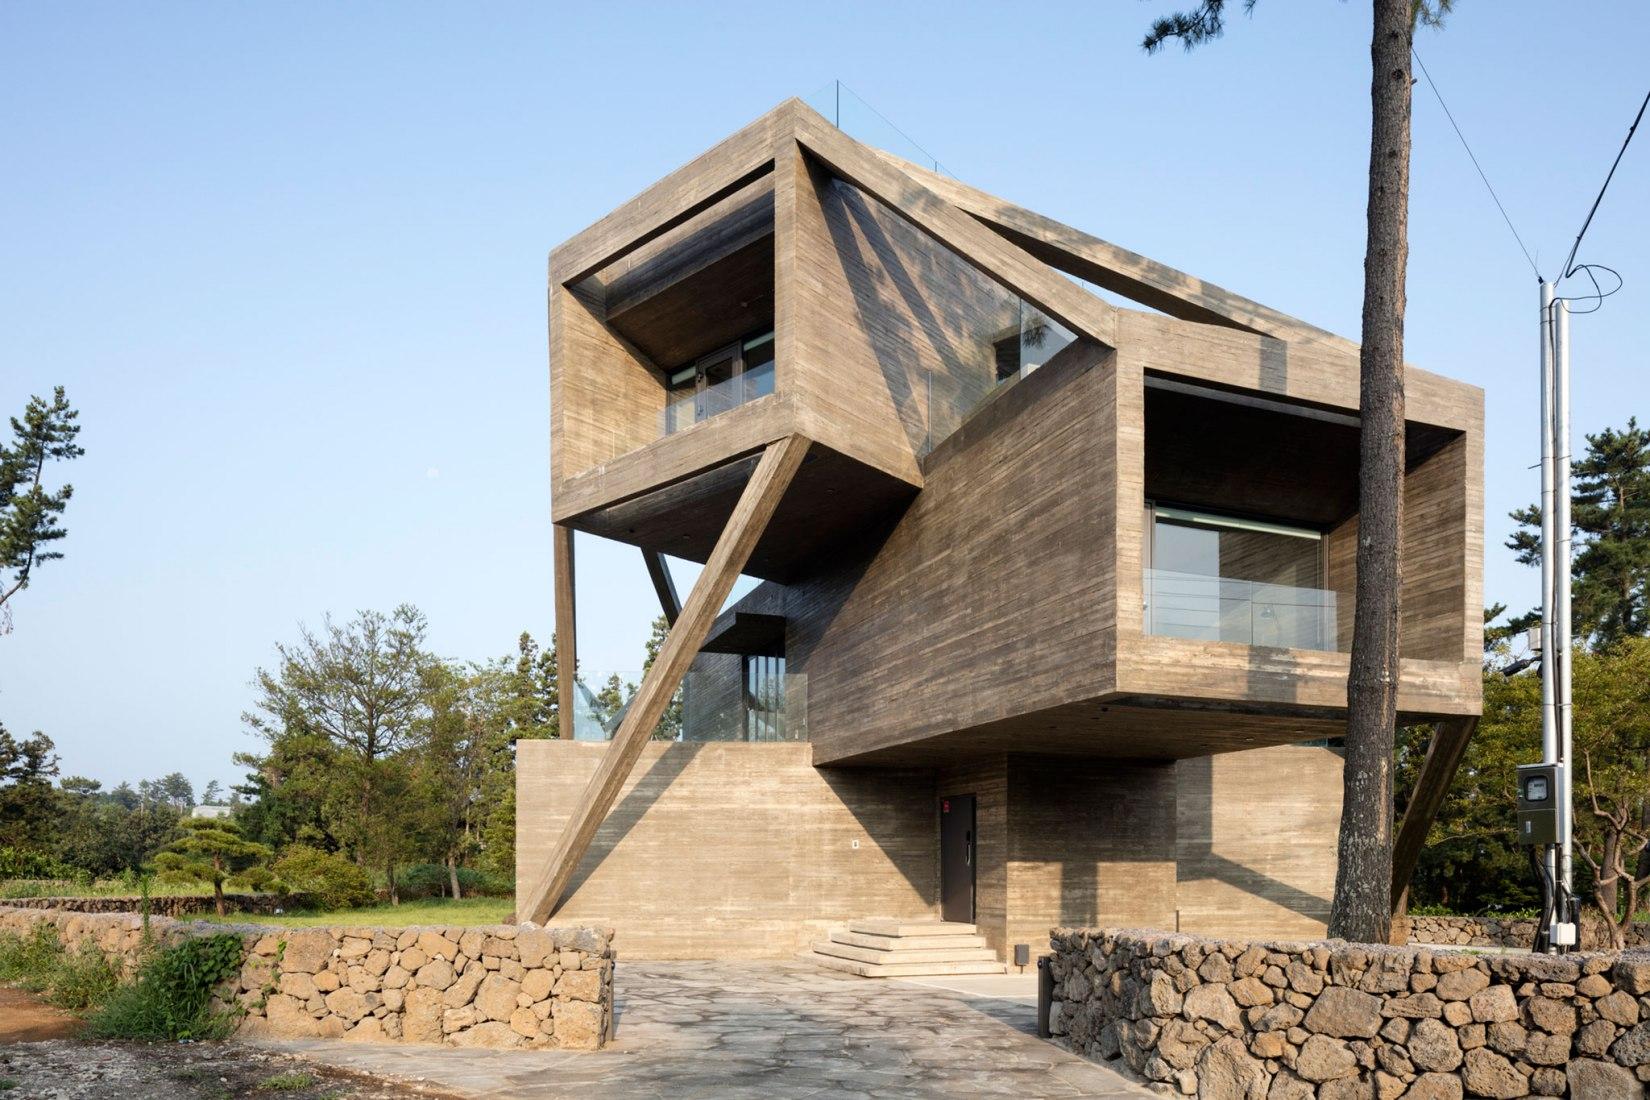 House in Jeju island by Moon Hoon. Courtesy of Moon Hoon